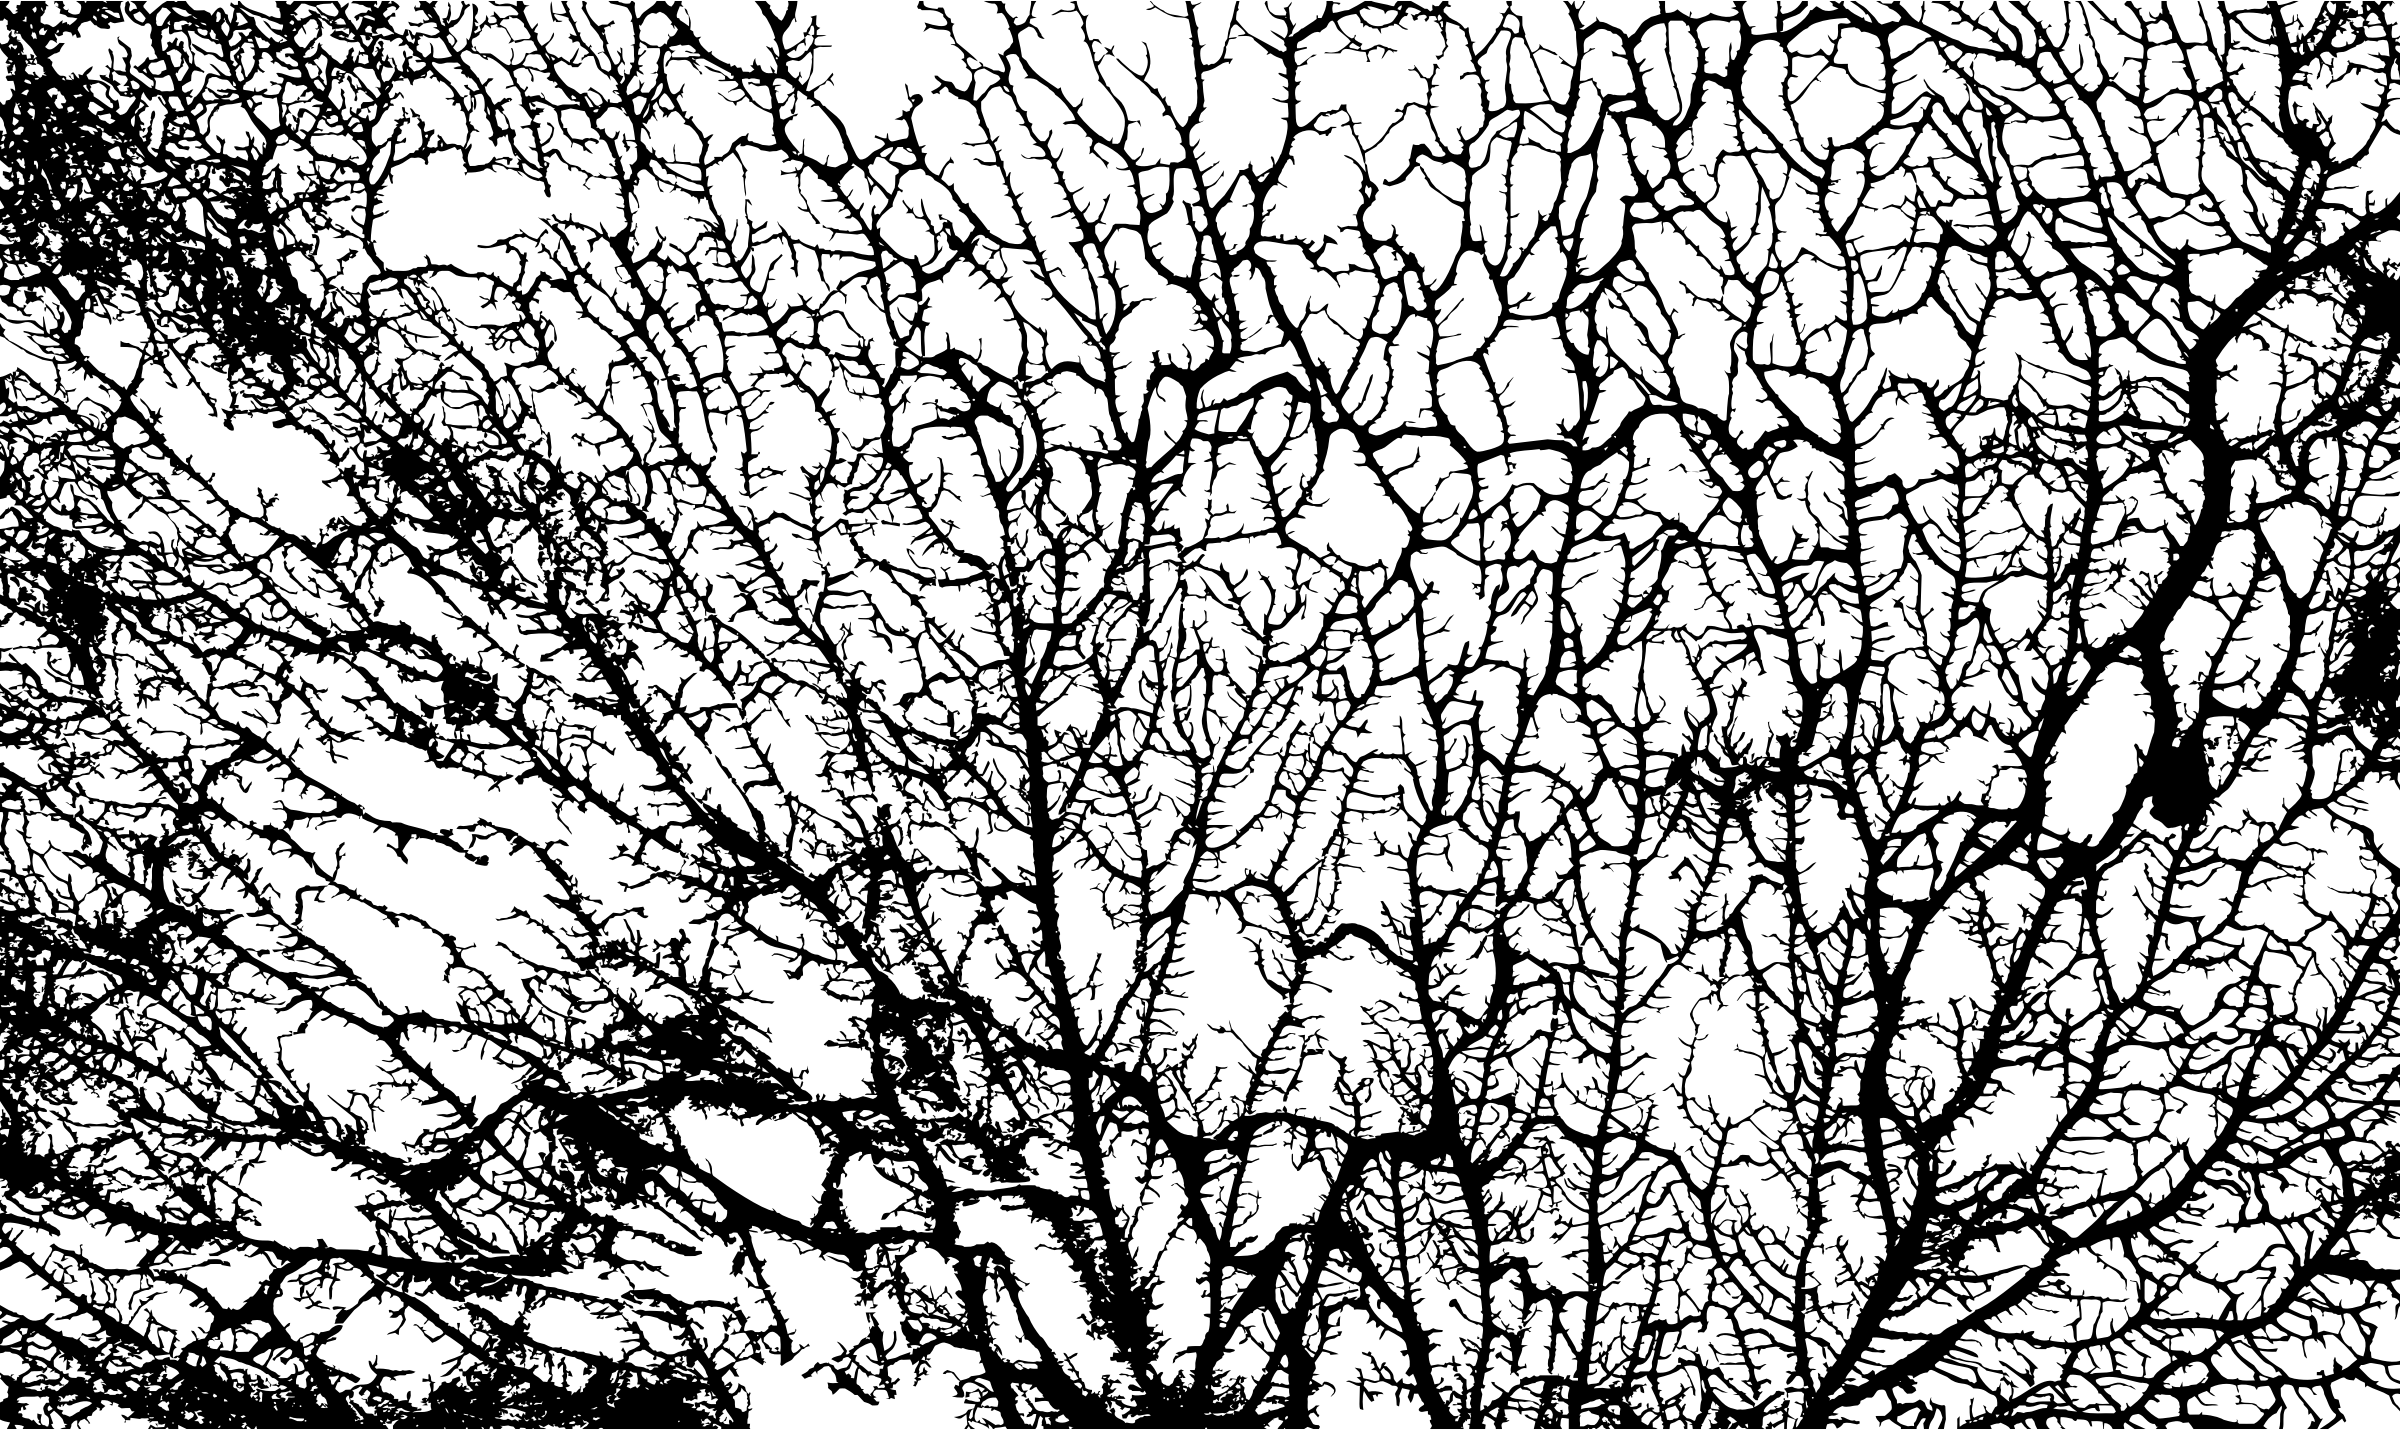 Black Veins Png Transparent Background Monochrome.